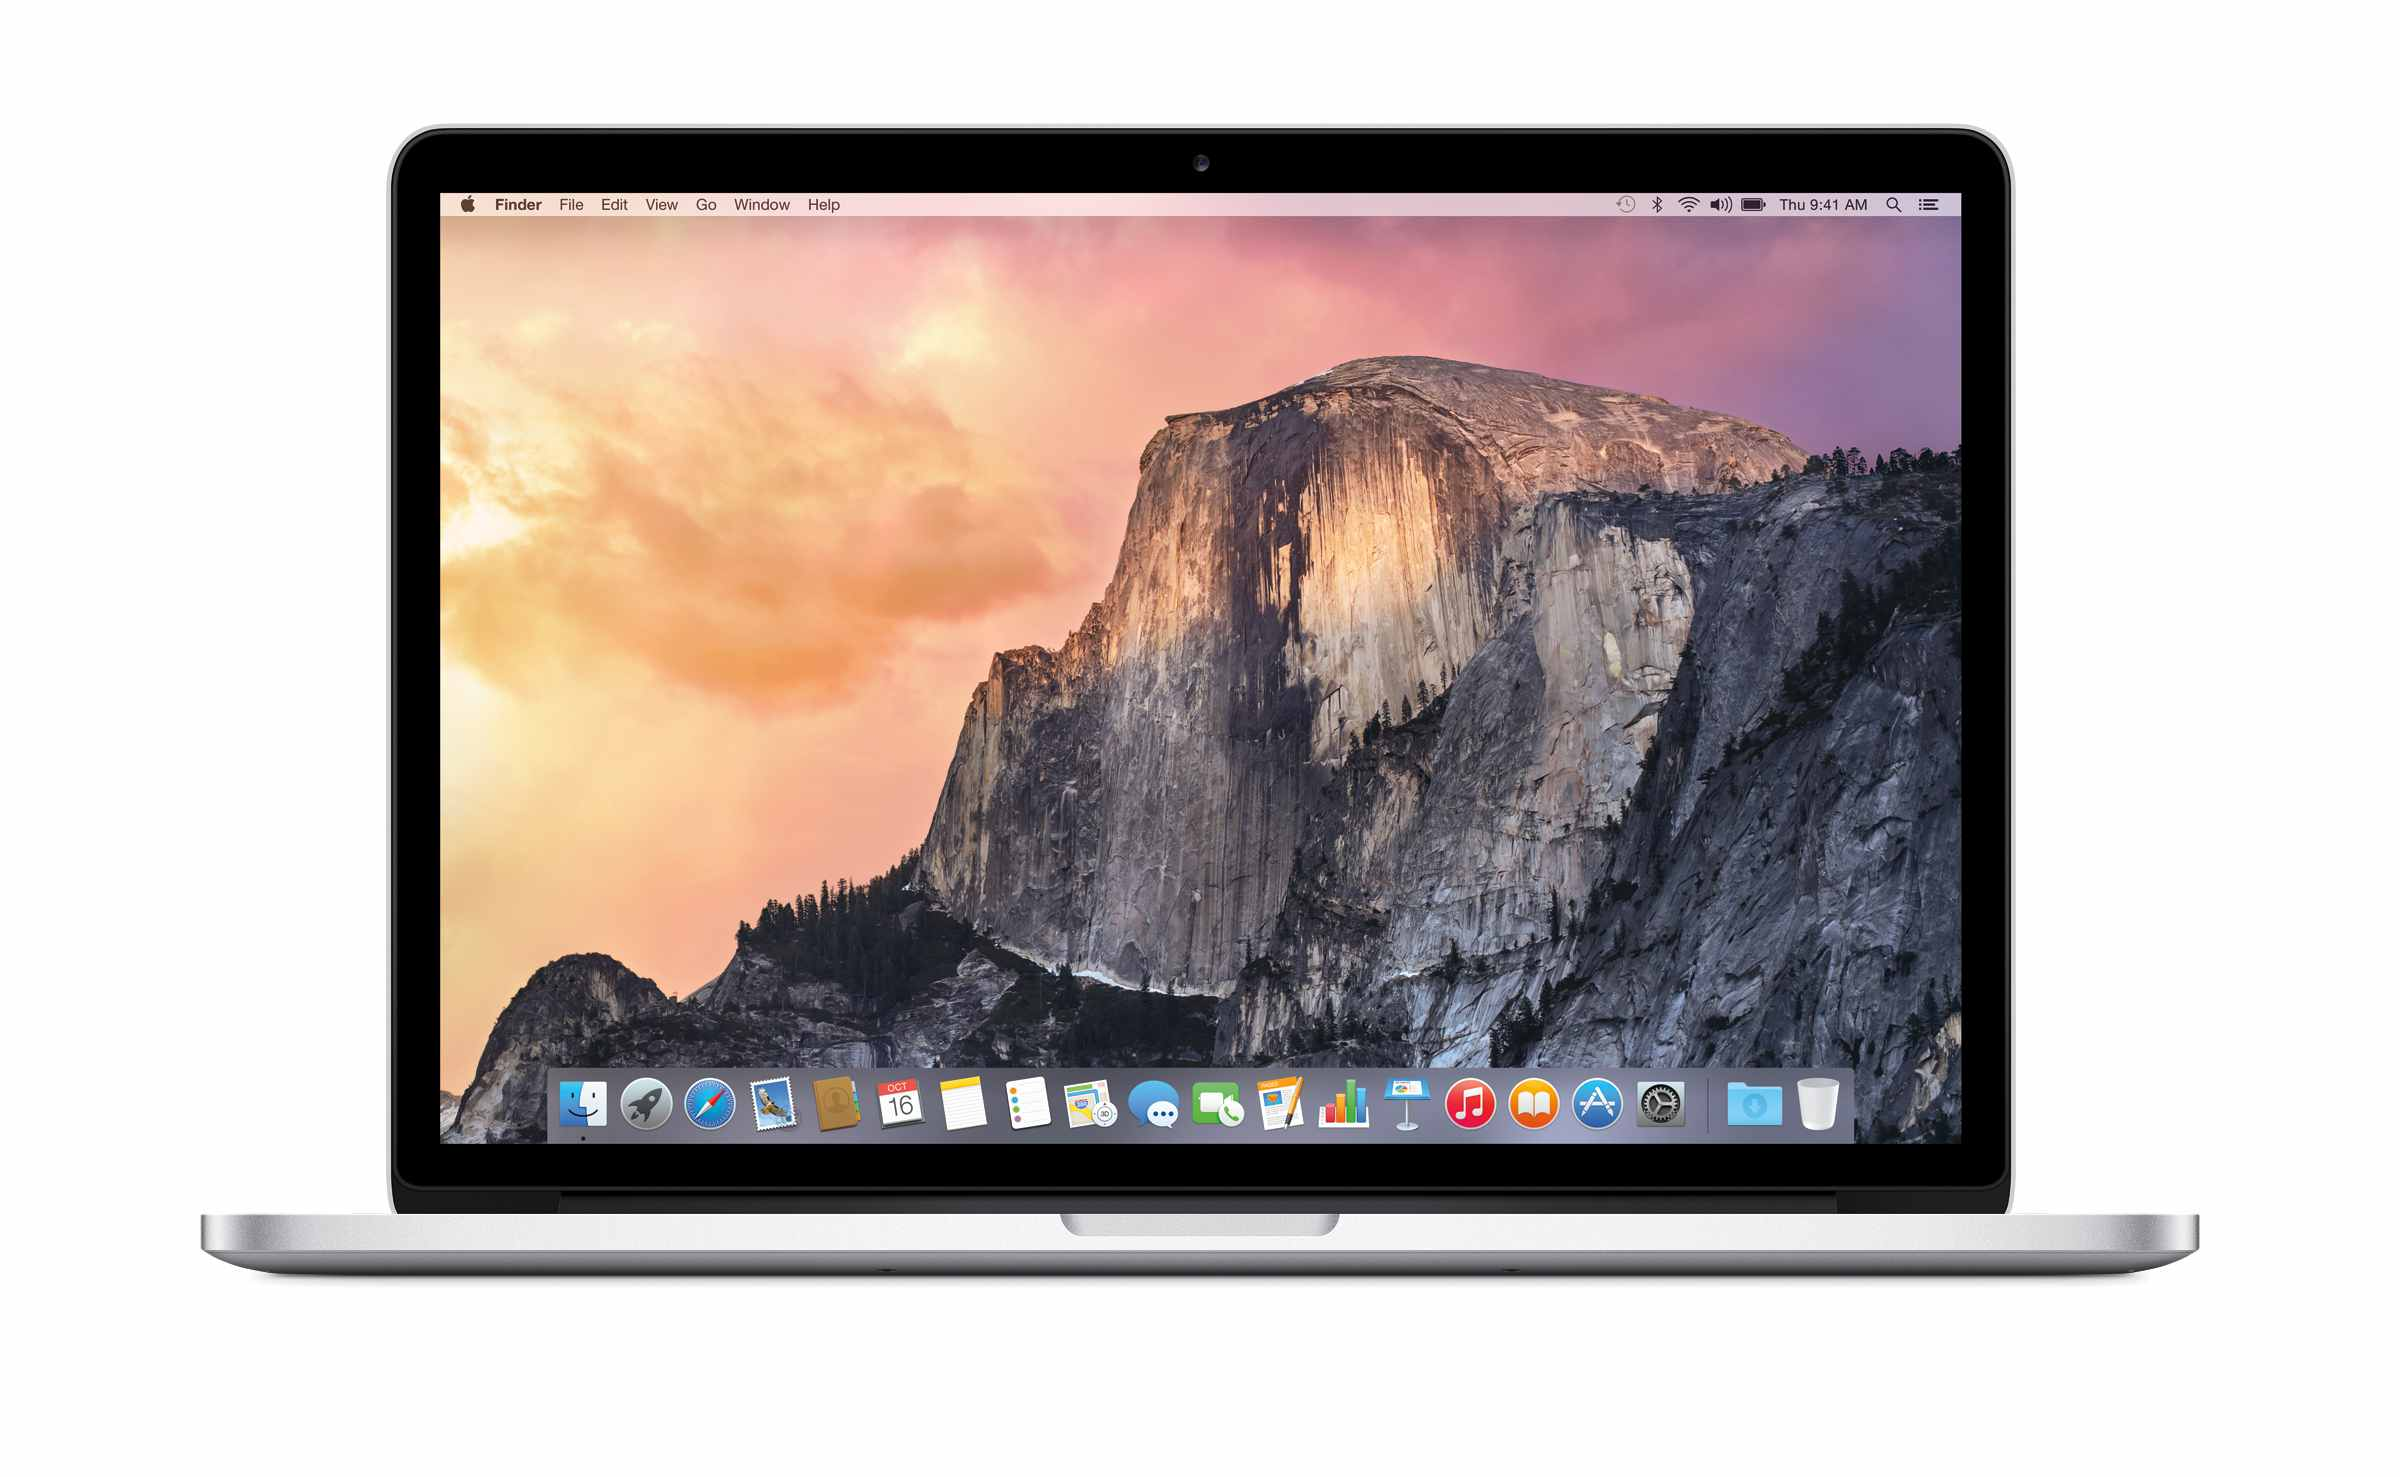 OS X Yosemite on MacBook Pro